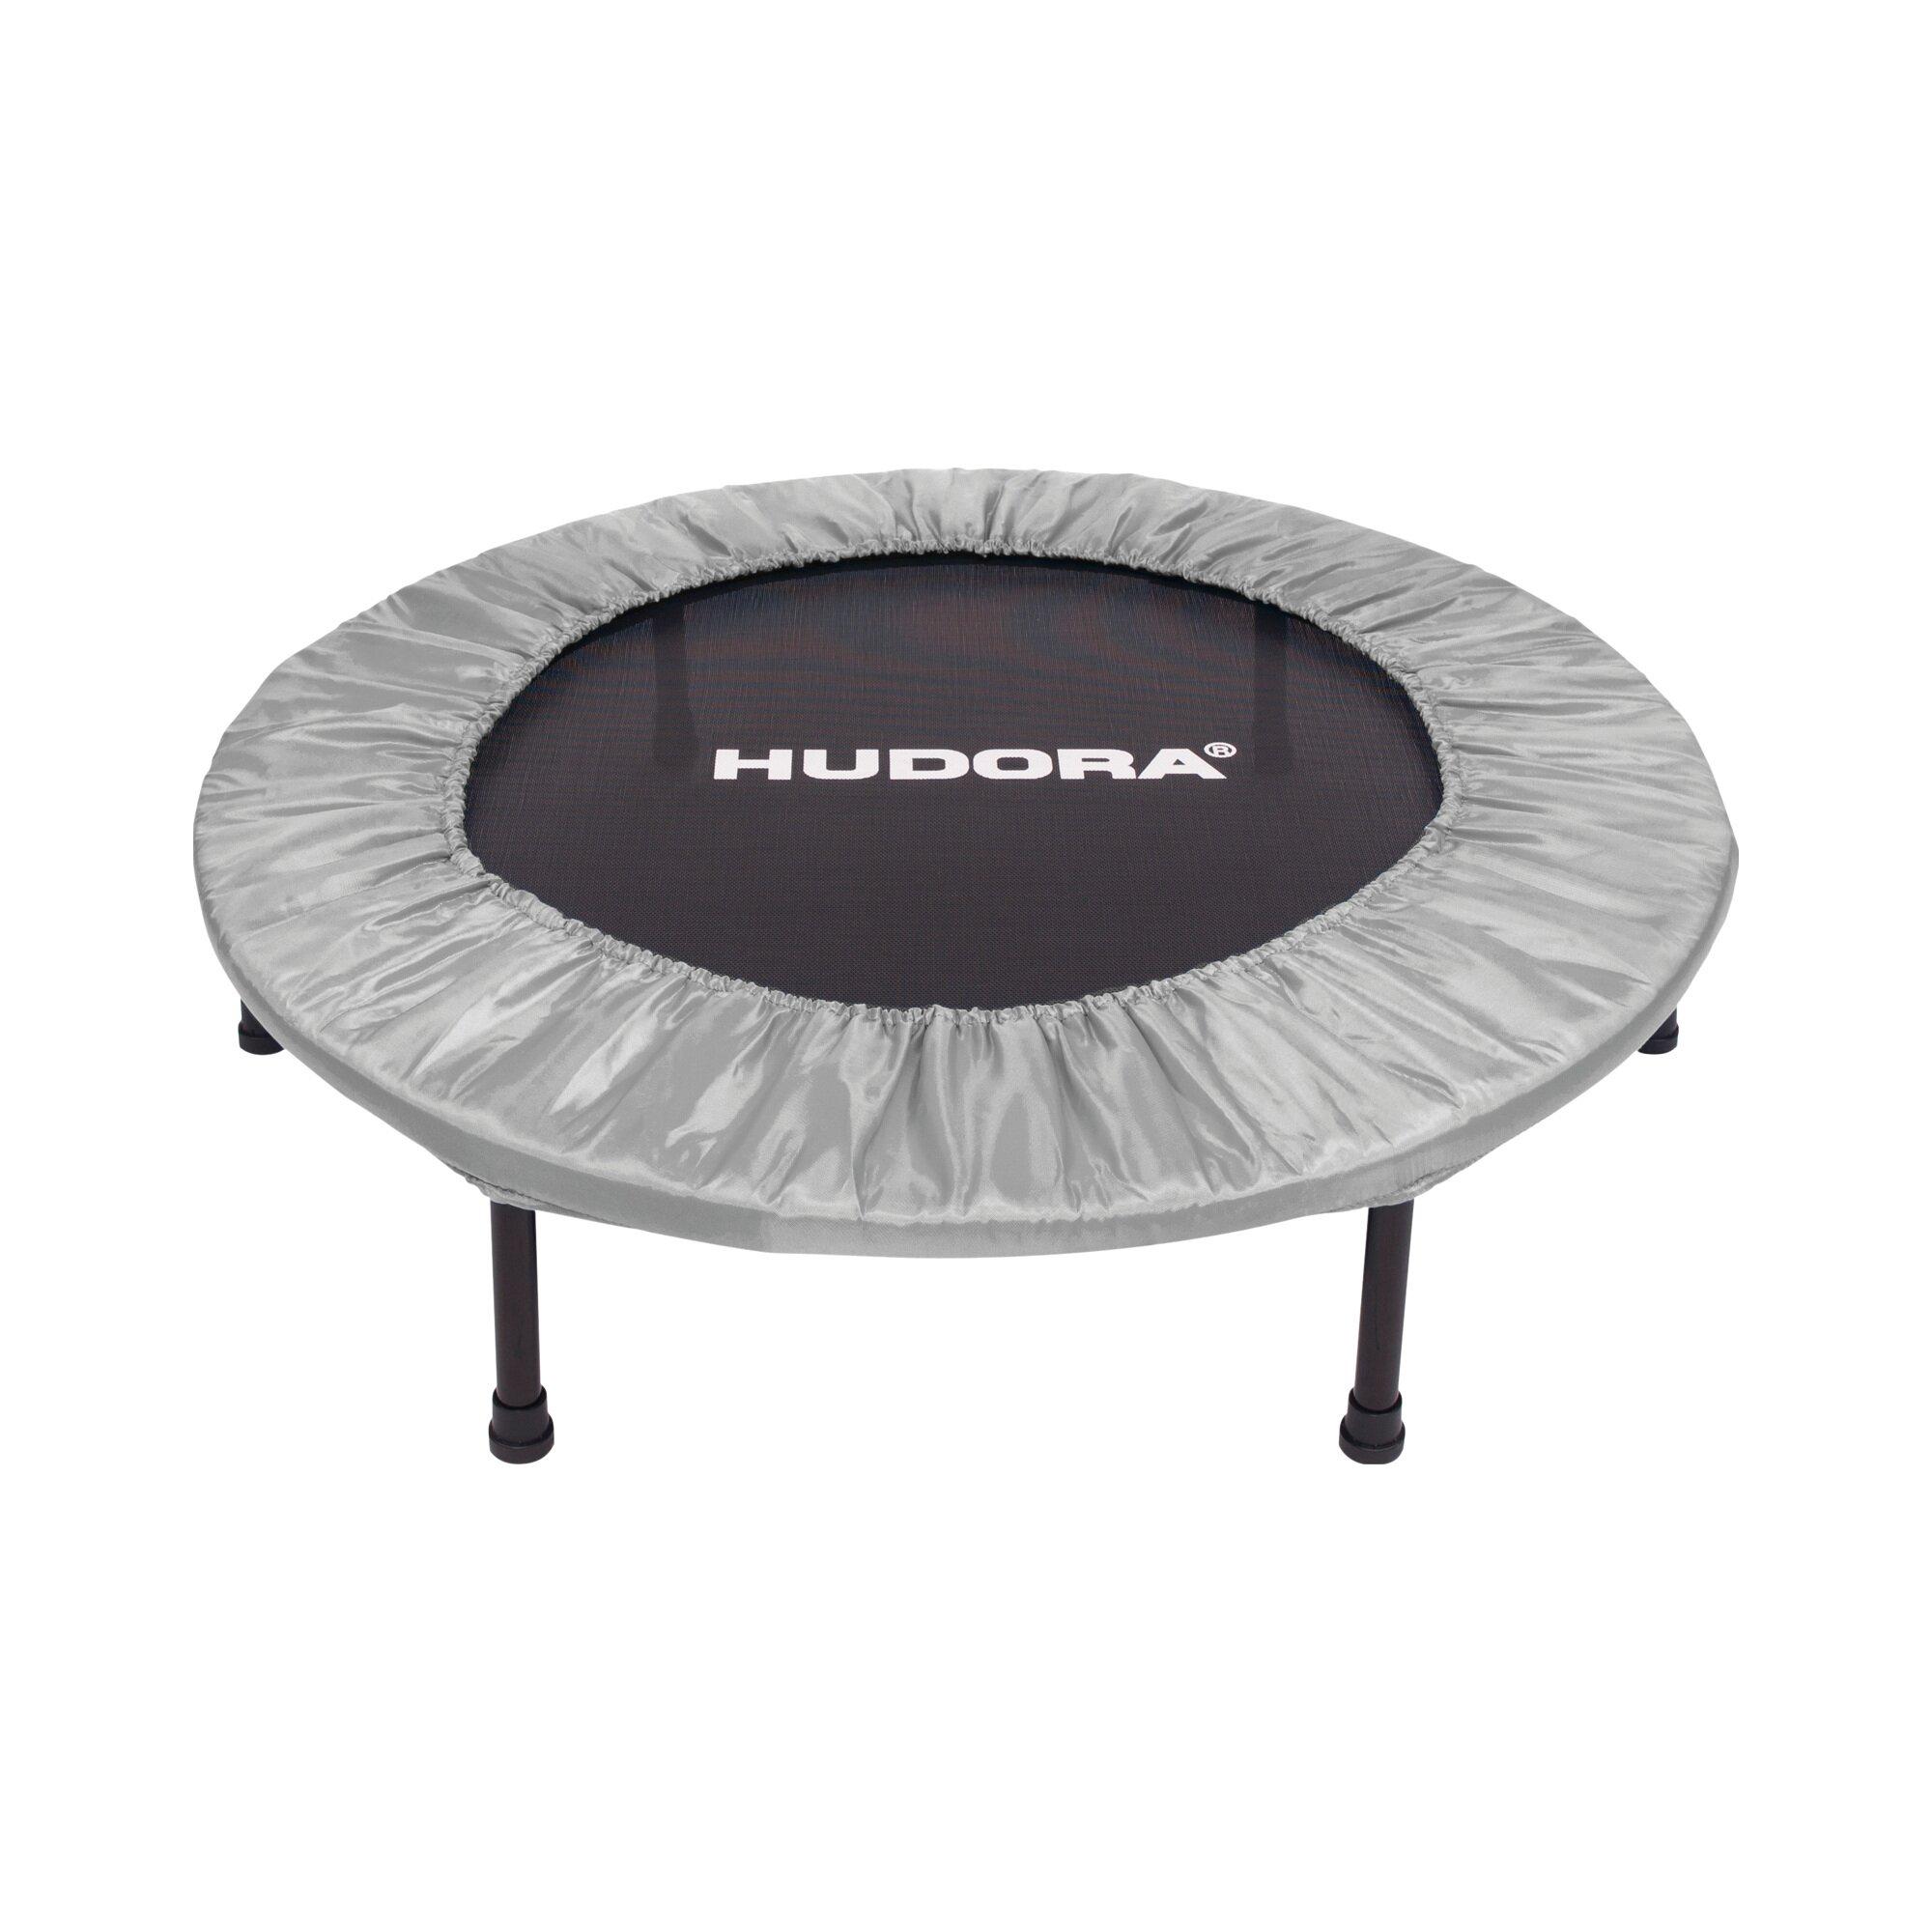 hudora-trampolin-faltbar-96-cm